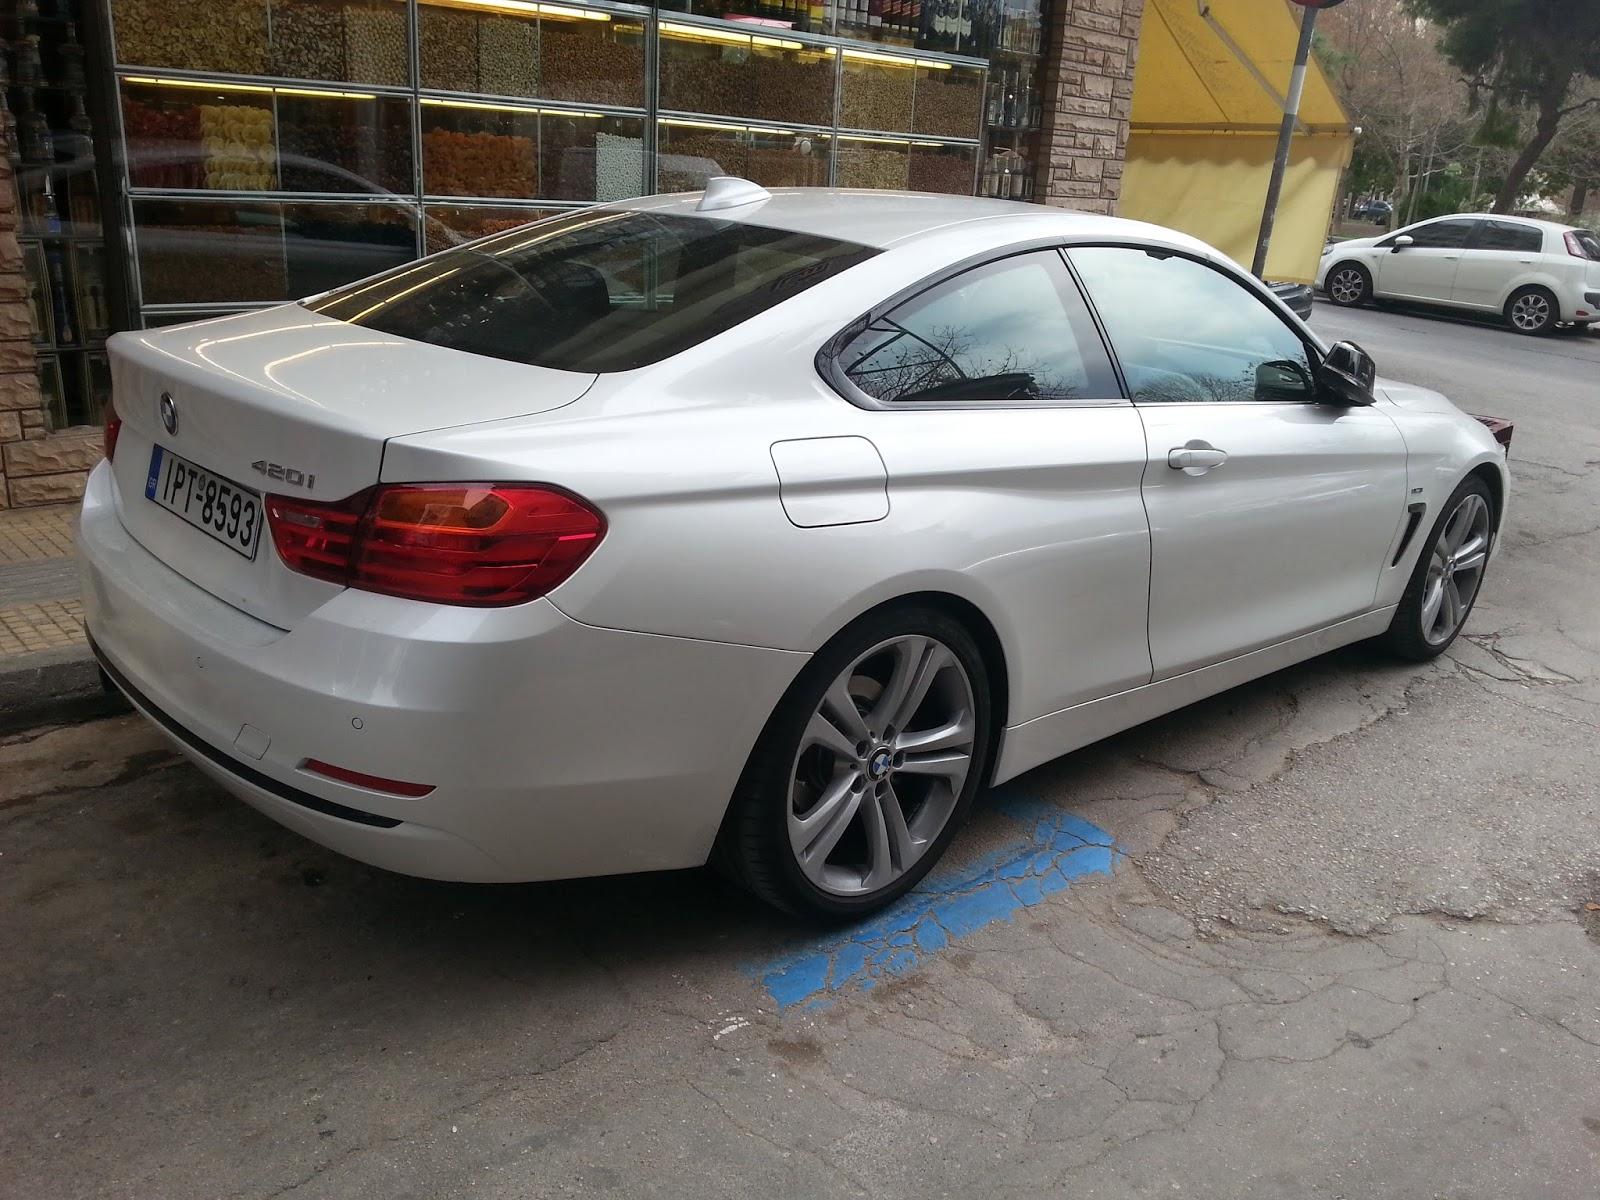 f1 3 Μπορεί να με συγκινήσει η BMW 420i; TEST, ΔΟΚΙΜΕΣ